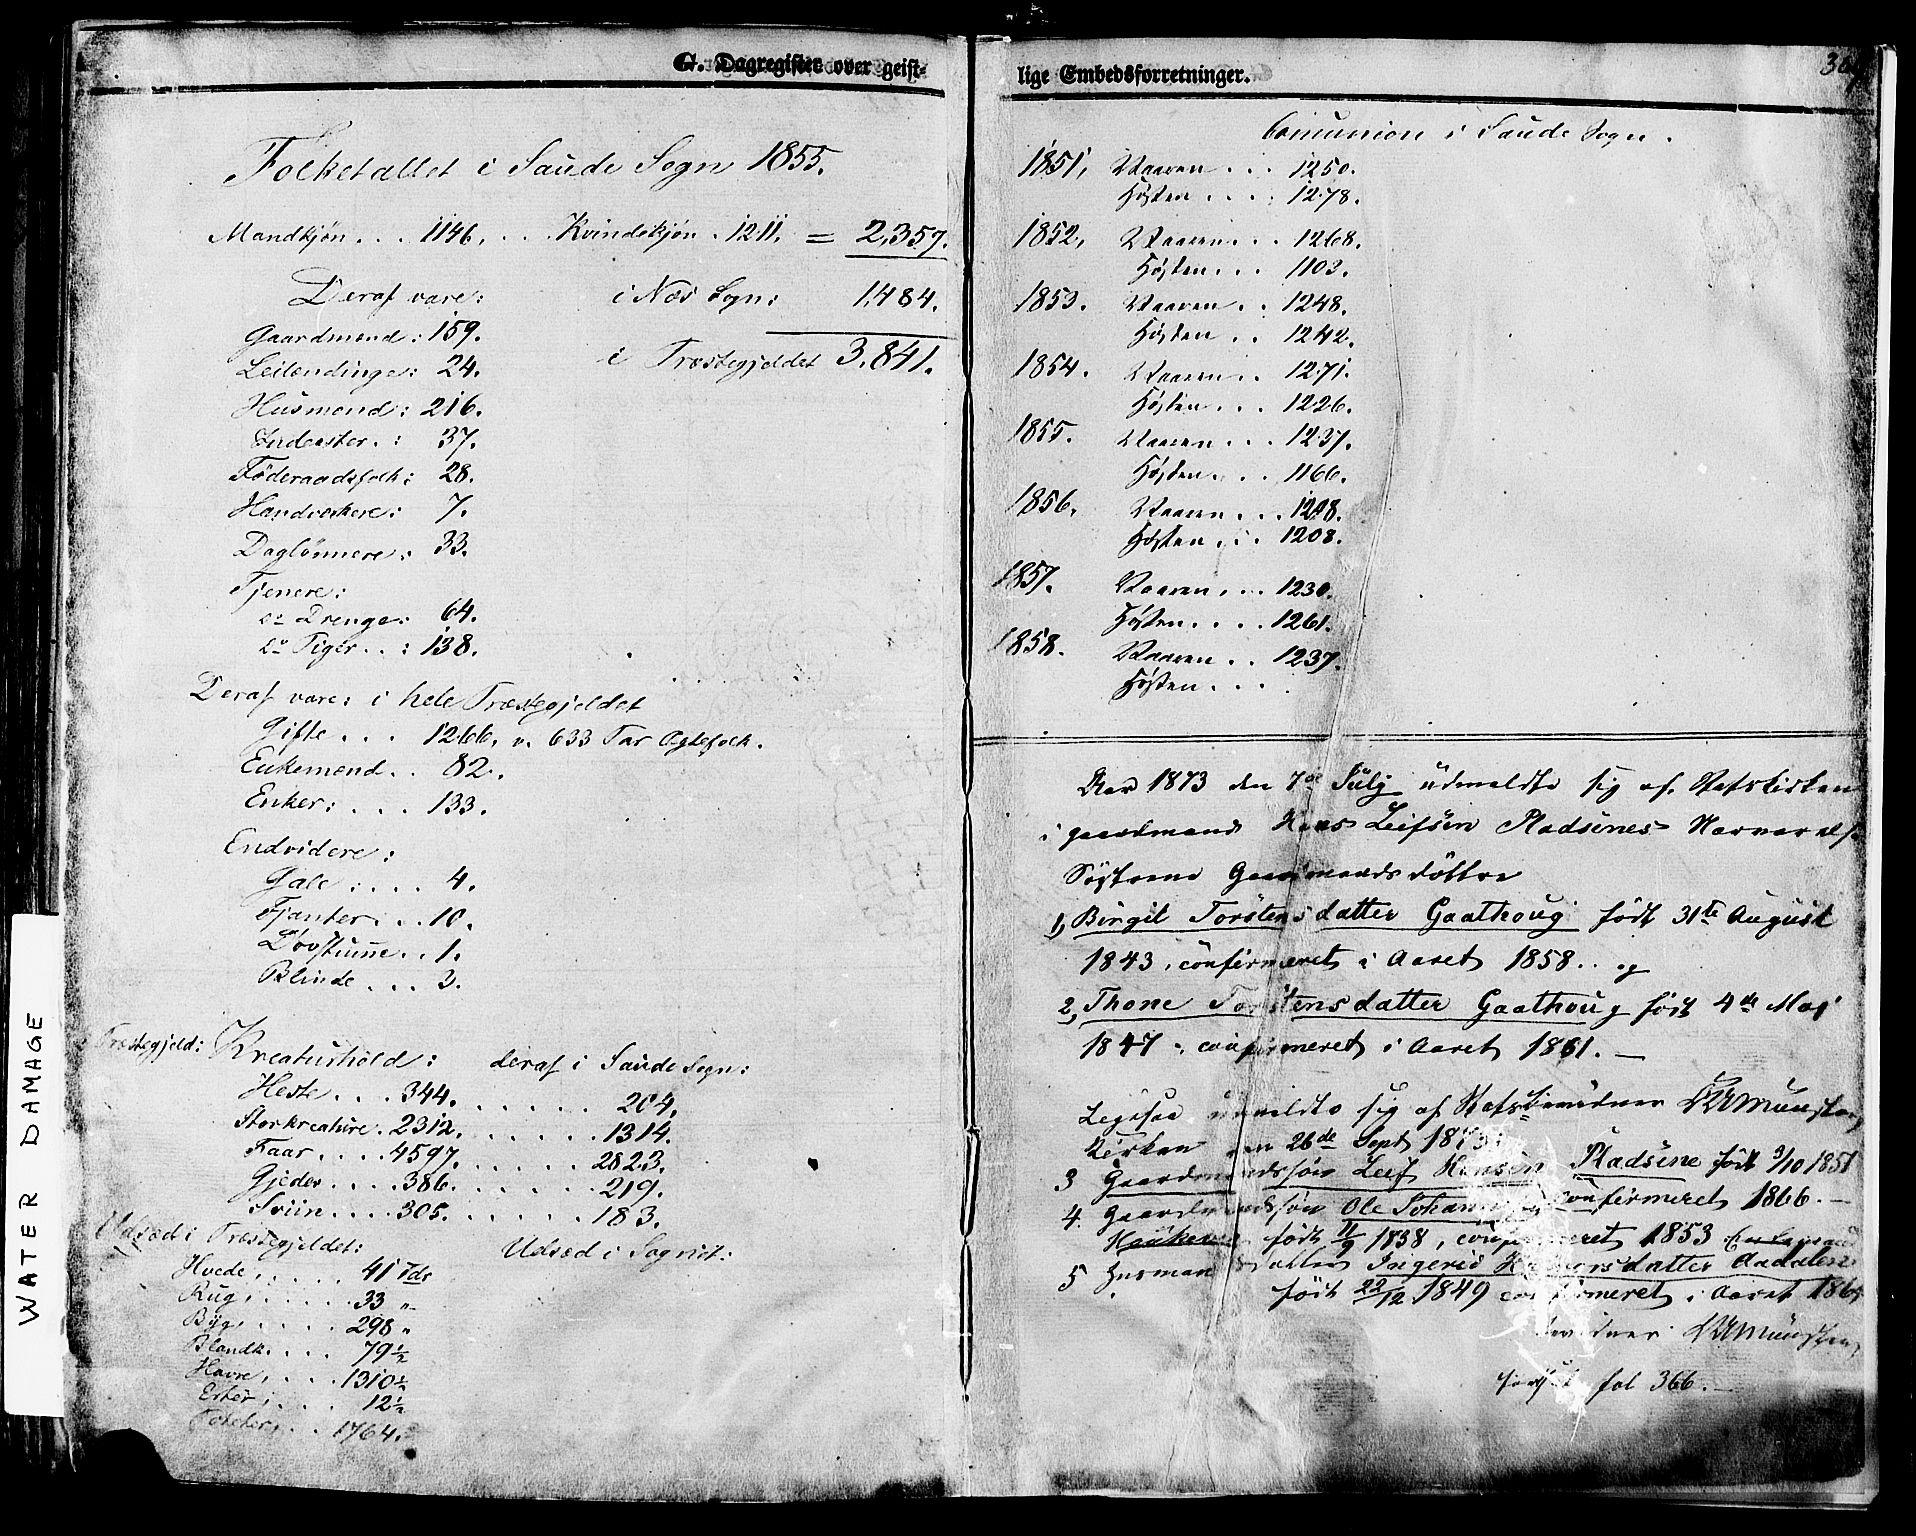 SAKO, Sauherad kirkebøker, F/Fa/L0007: Ministerialbok nr. I 7, 1851-1873, s. 369